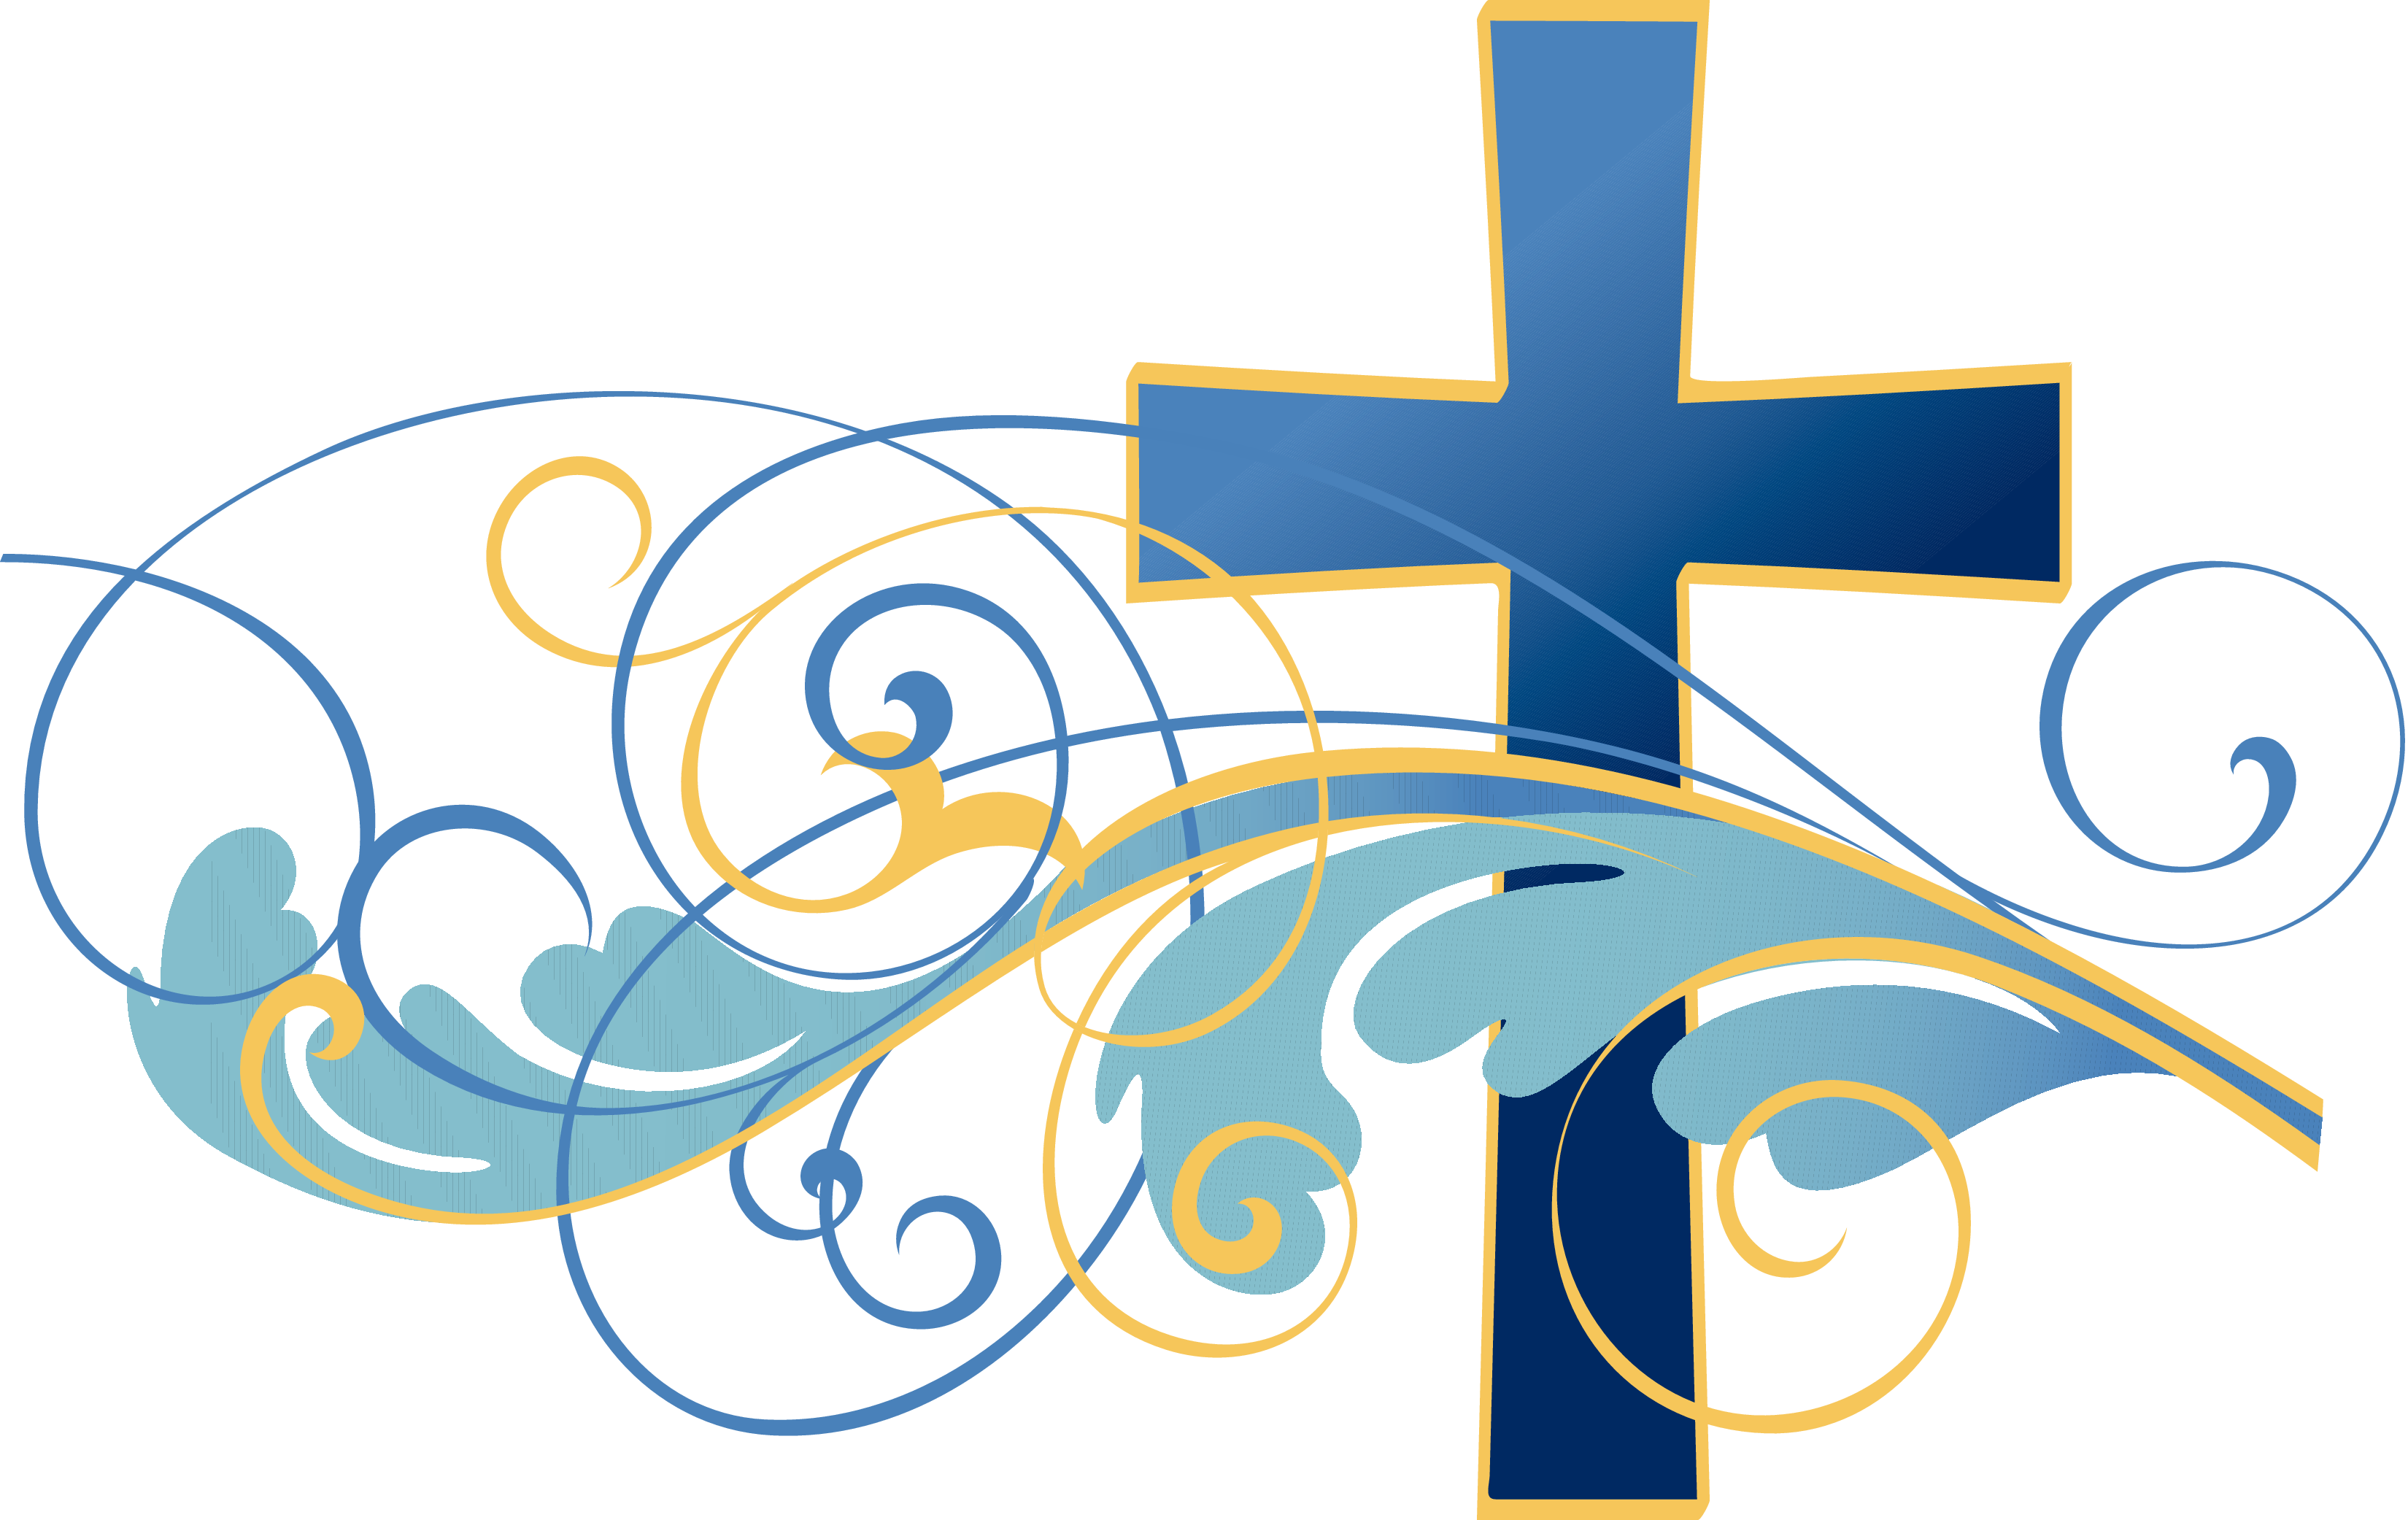 Ordination Service Cliparts #2881485 - Ordination Service PNG